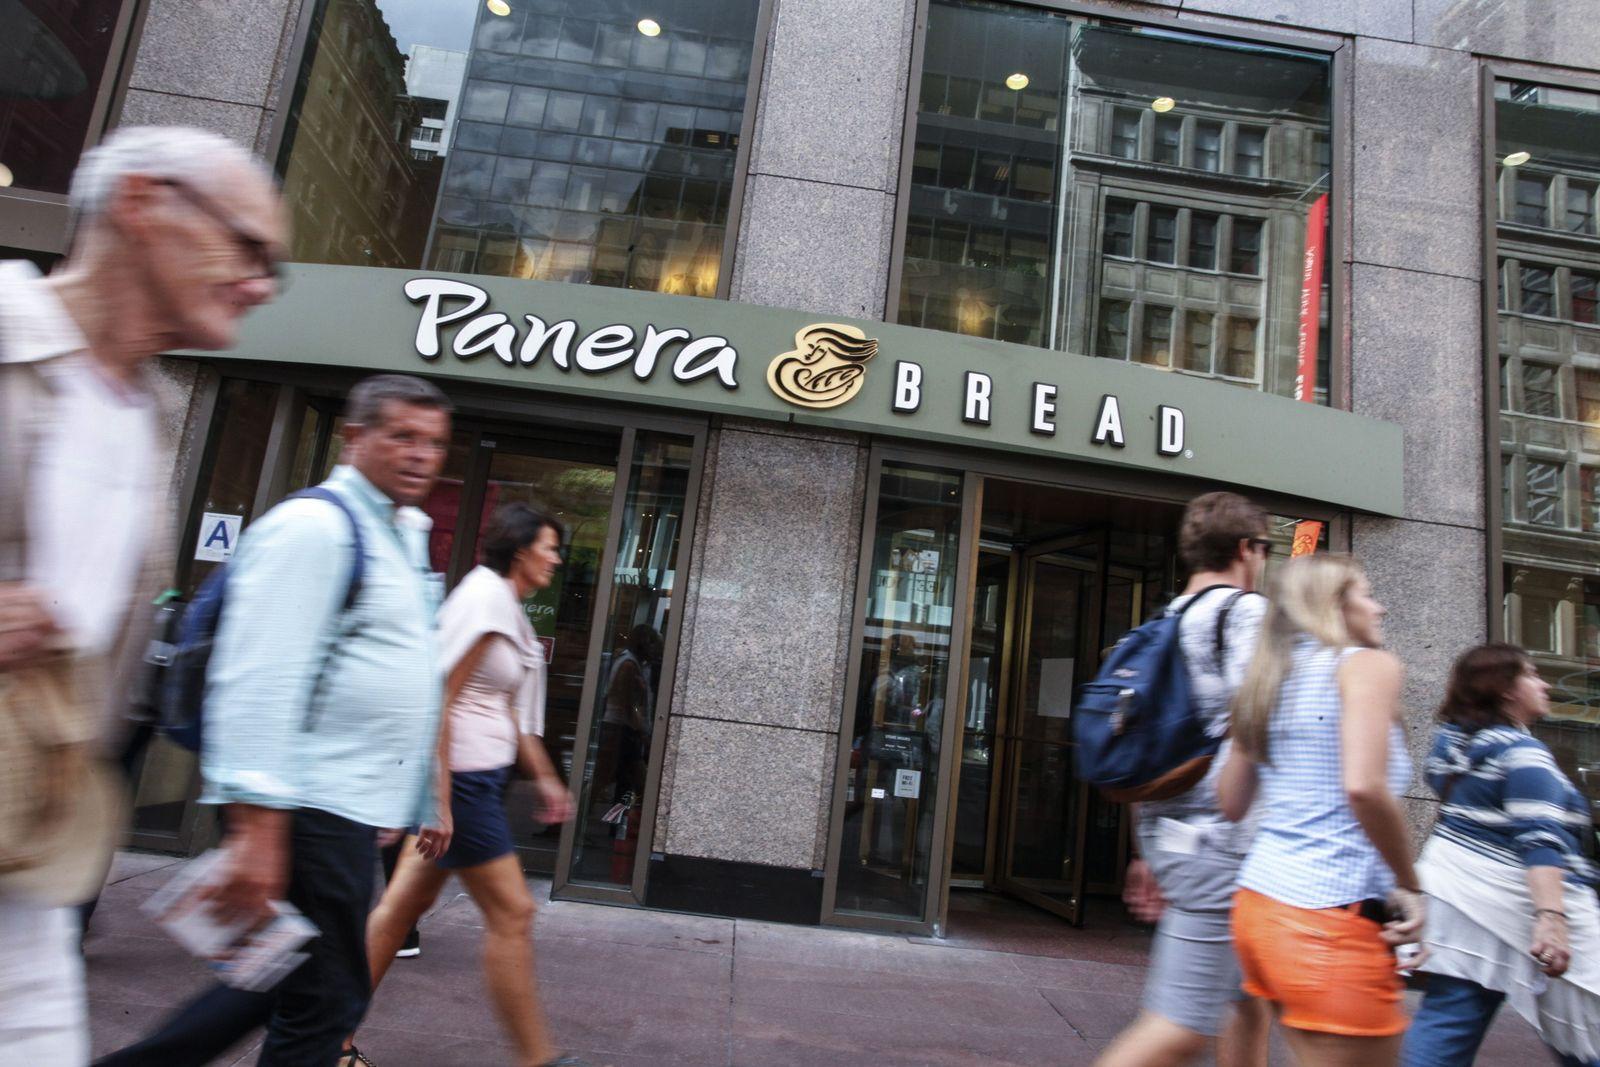 Panera Bread / Manhatten New York